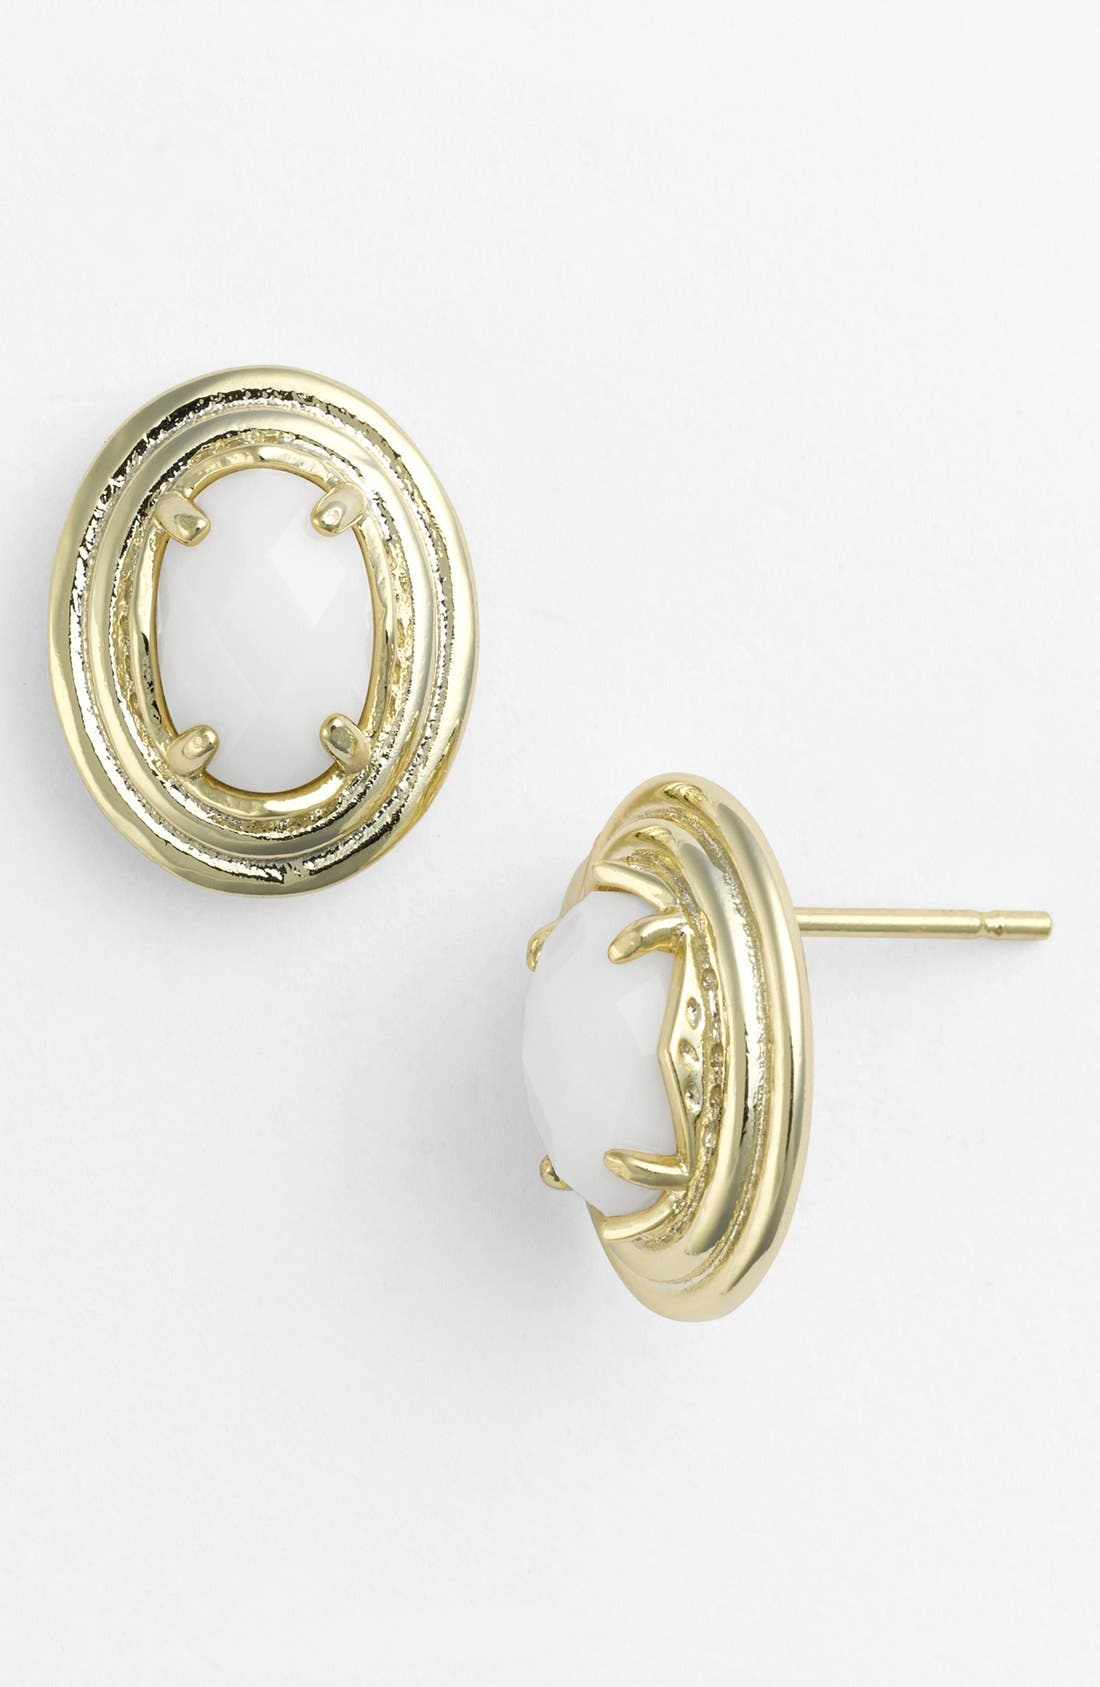 Alternate Image 1 Selected - Kendra Scott 'Yurko' Oval Stud Earrings